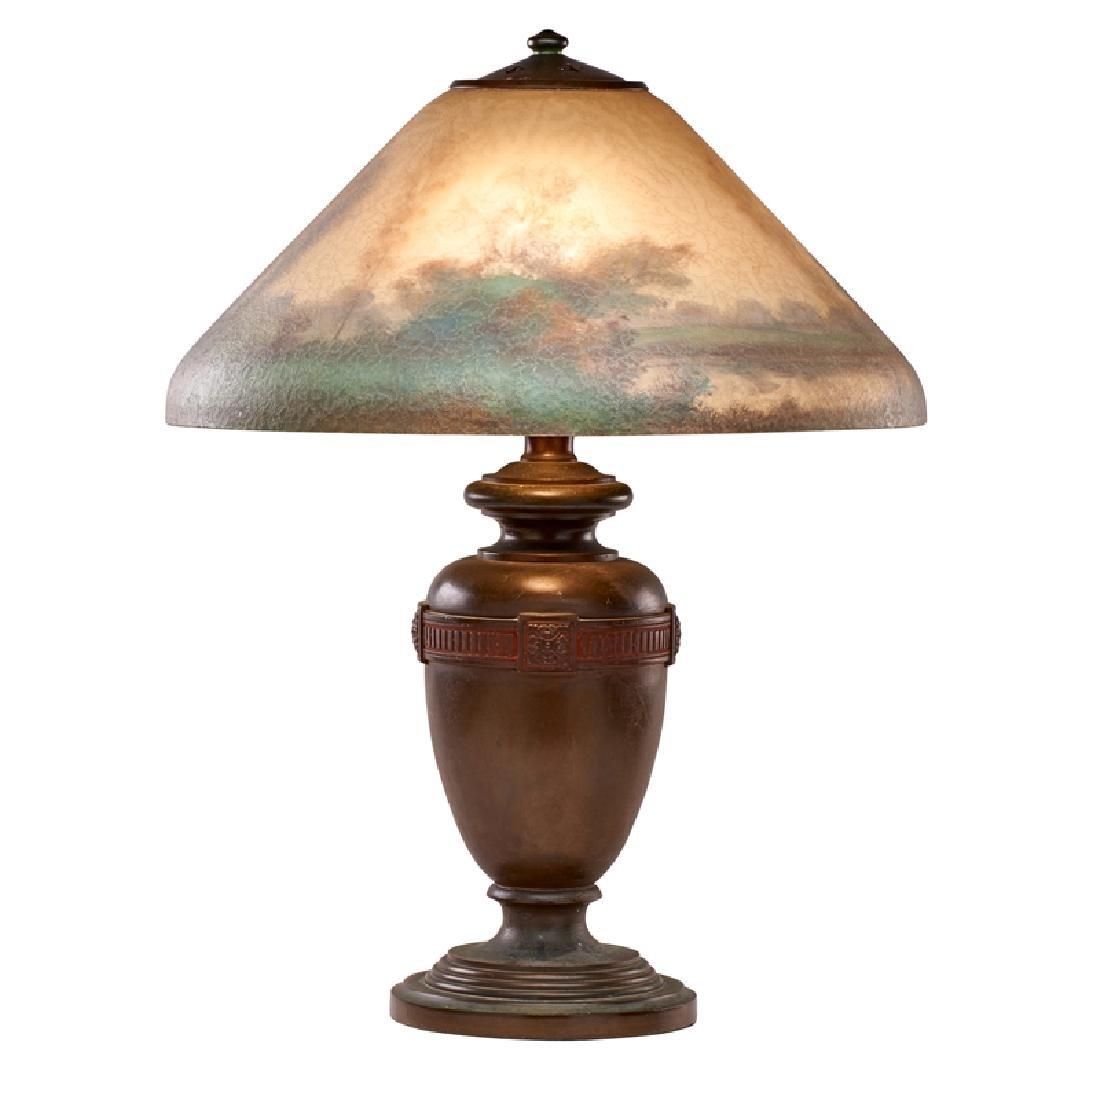 HANDEL Table lamp with lakeland scene - 2